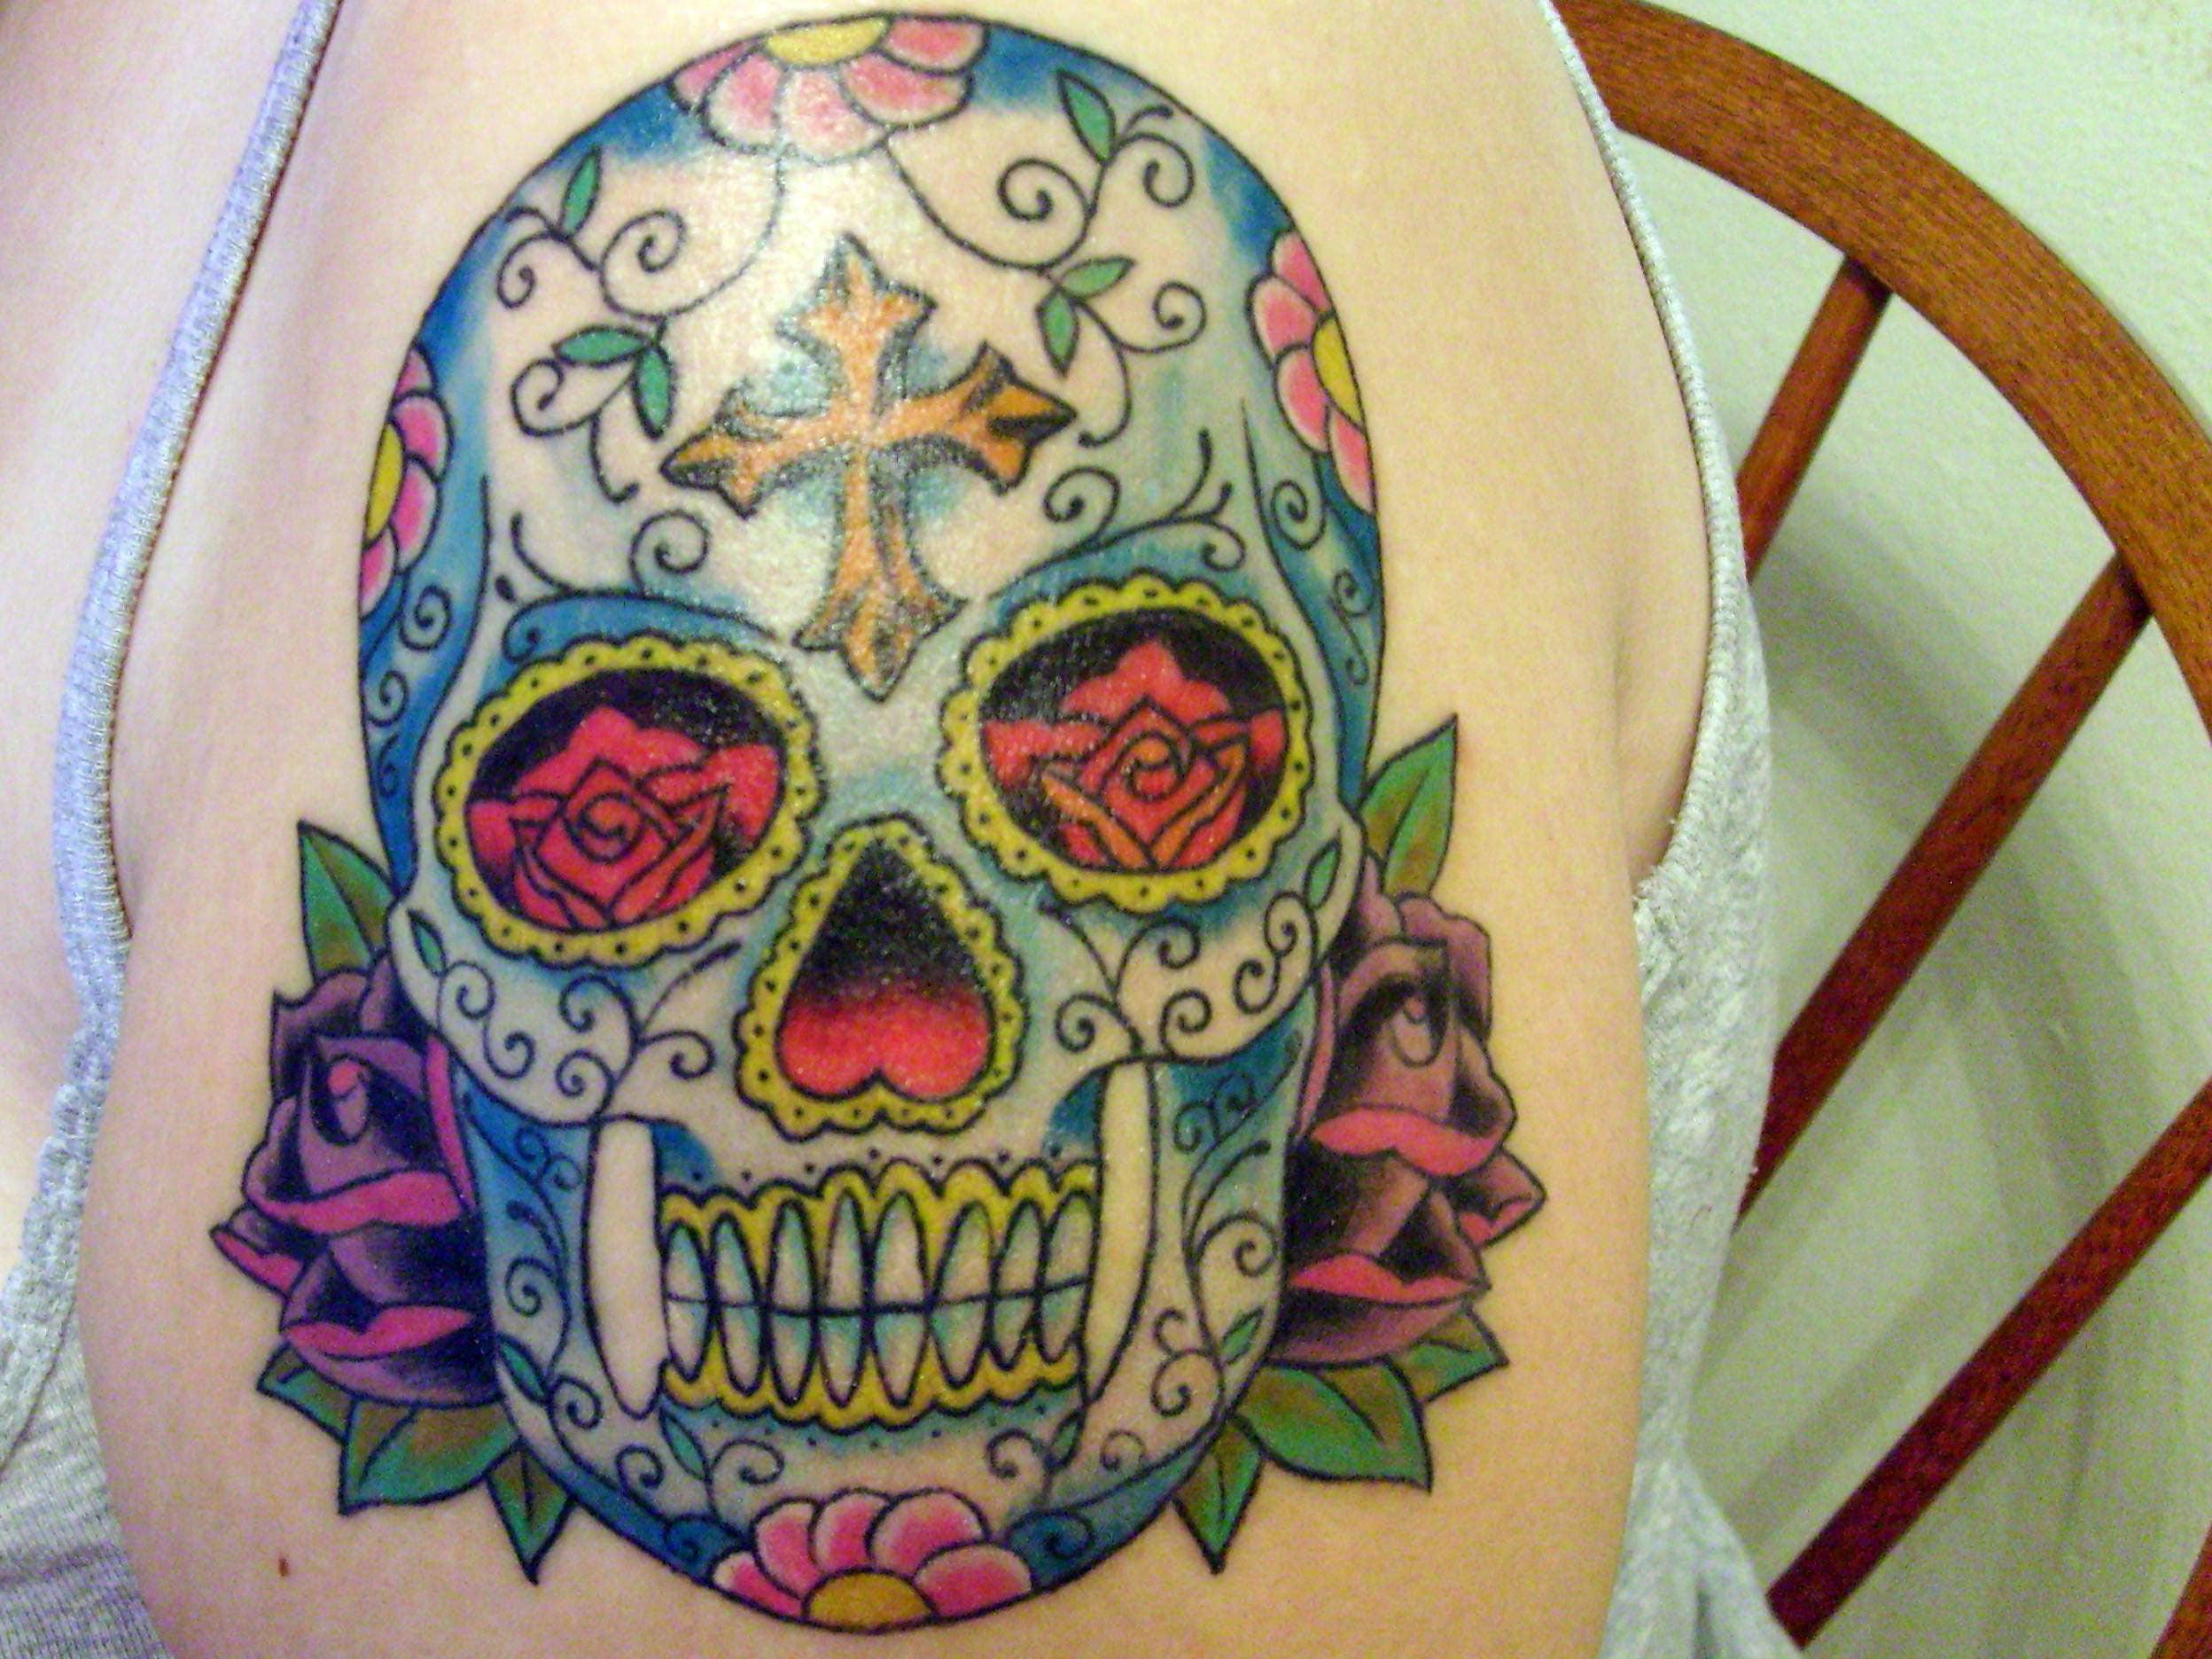 Sugar skull meaning tattoo cool tattoos bonbaden for Sugar skulls tattoos meaning